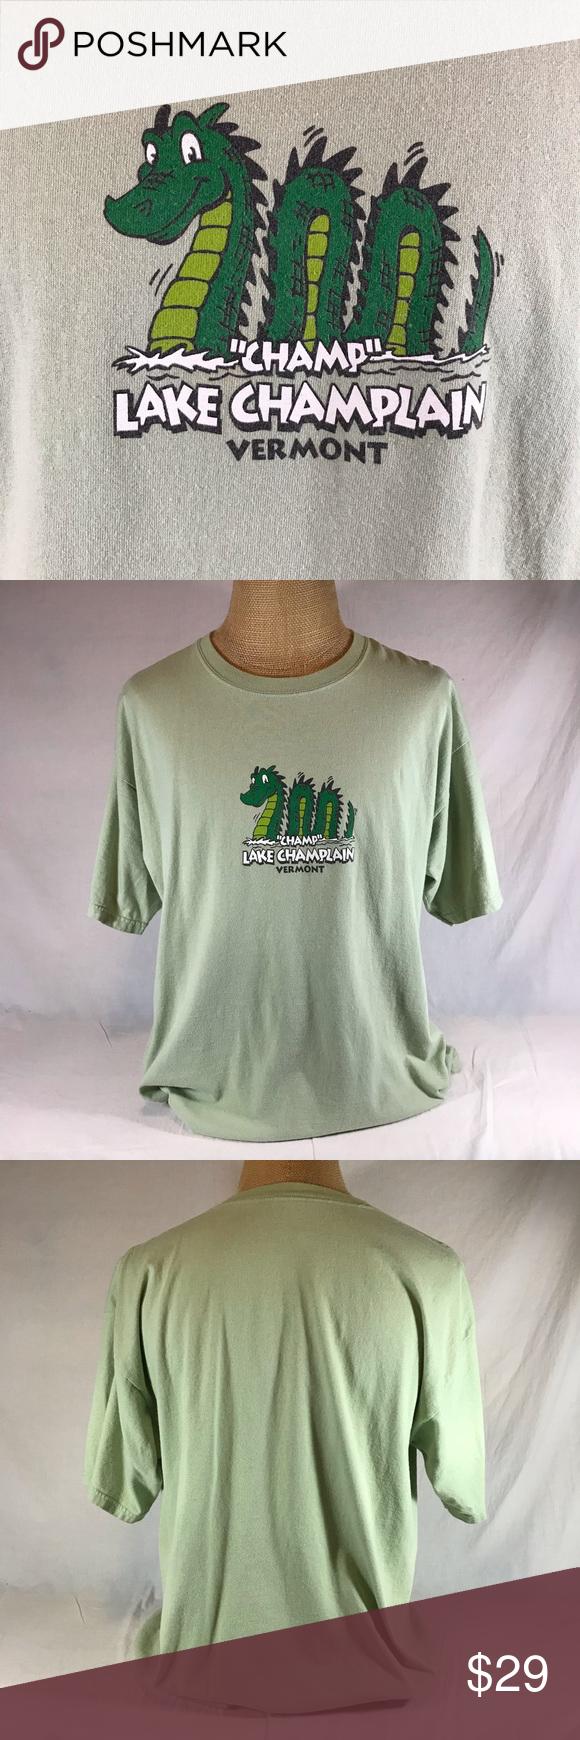 Sold Vermont Champ Lake Champlain Monstertshirt Colorful Shirts Monster Tshirt Lake Champlain